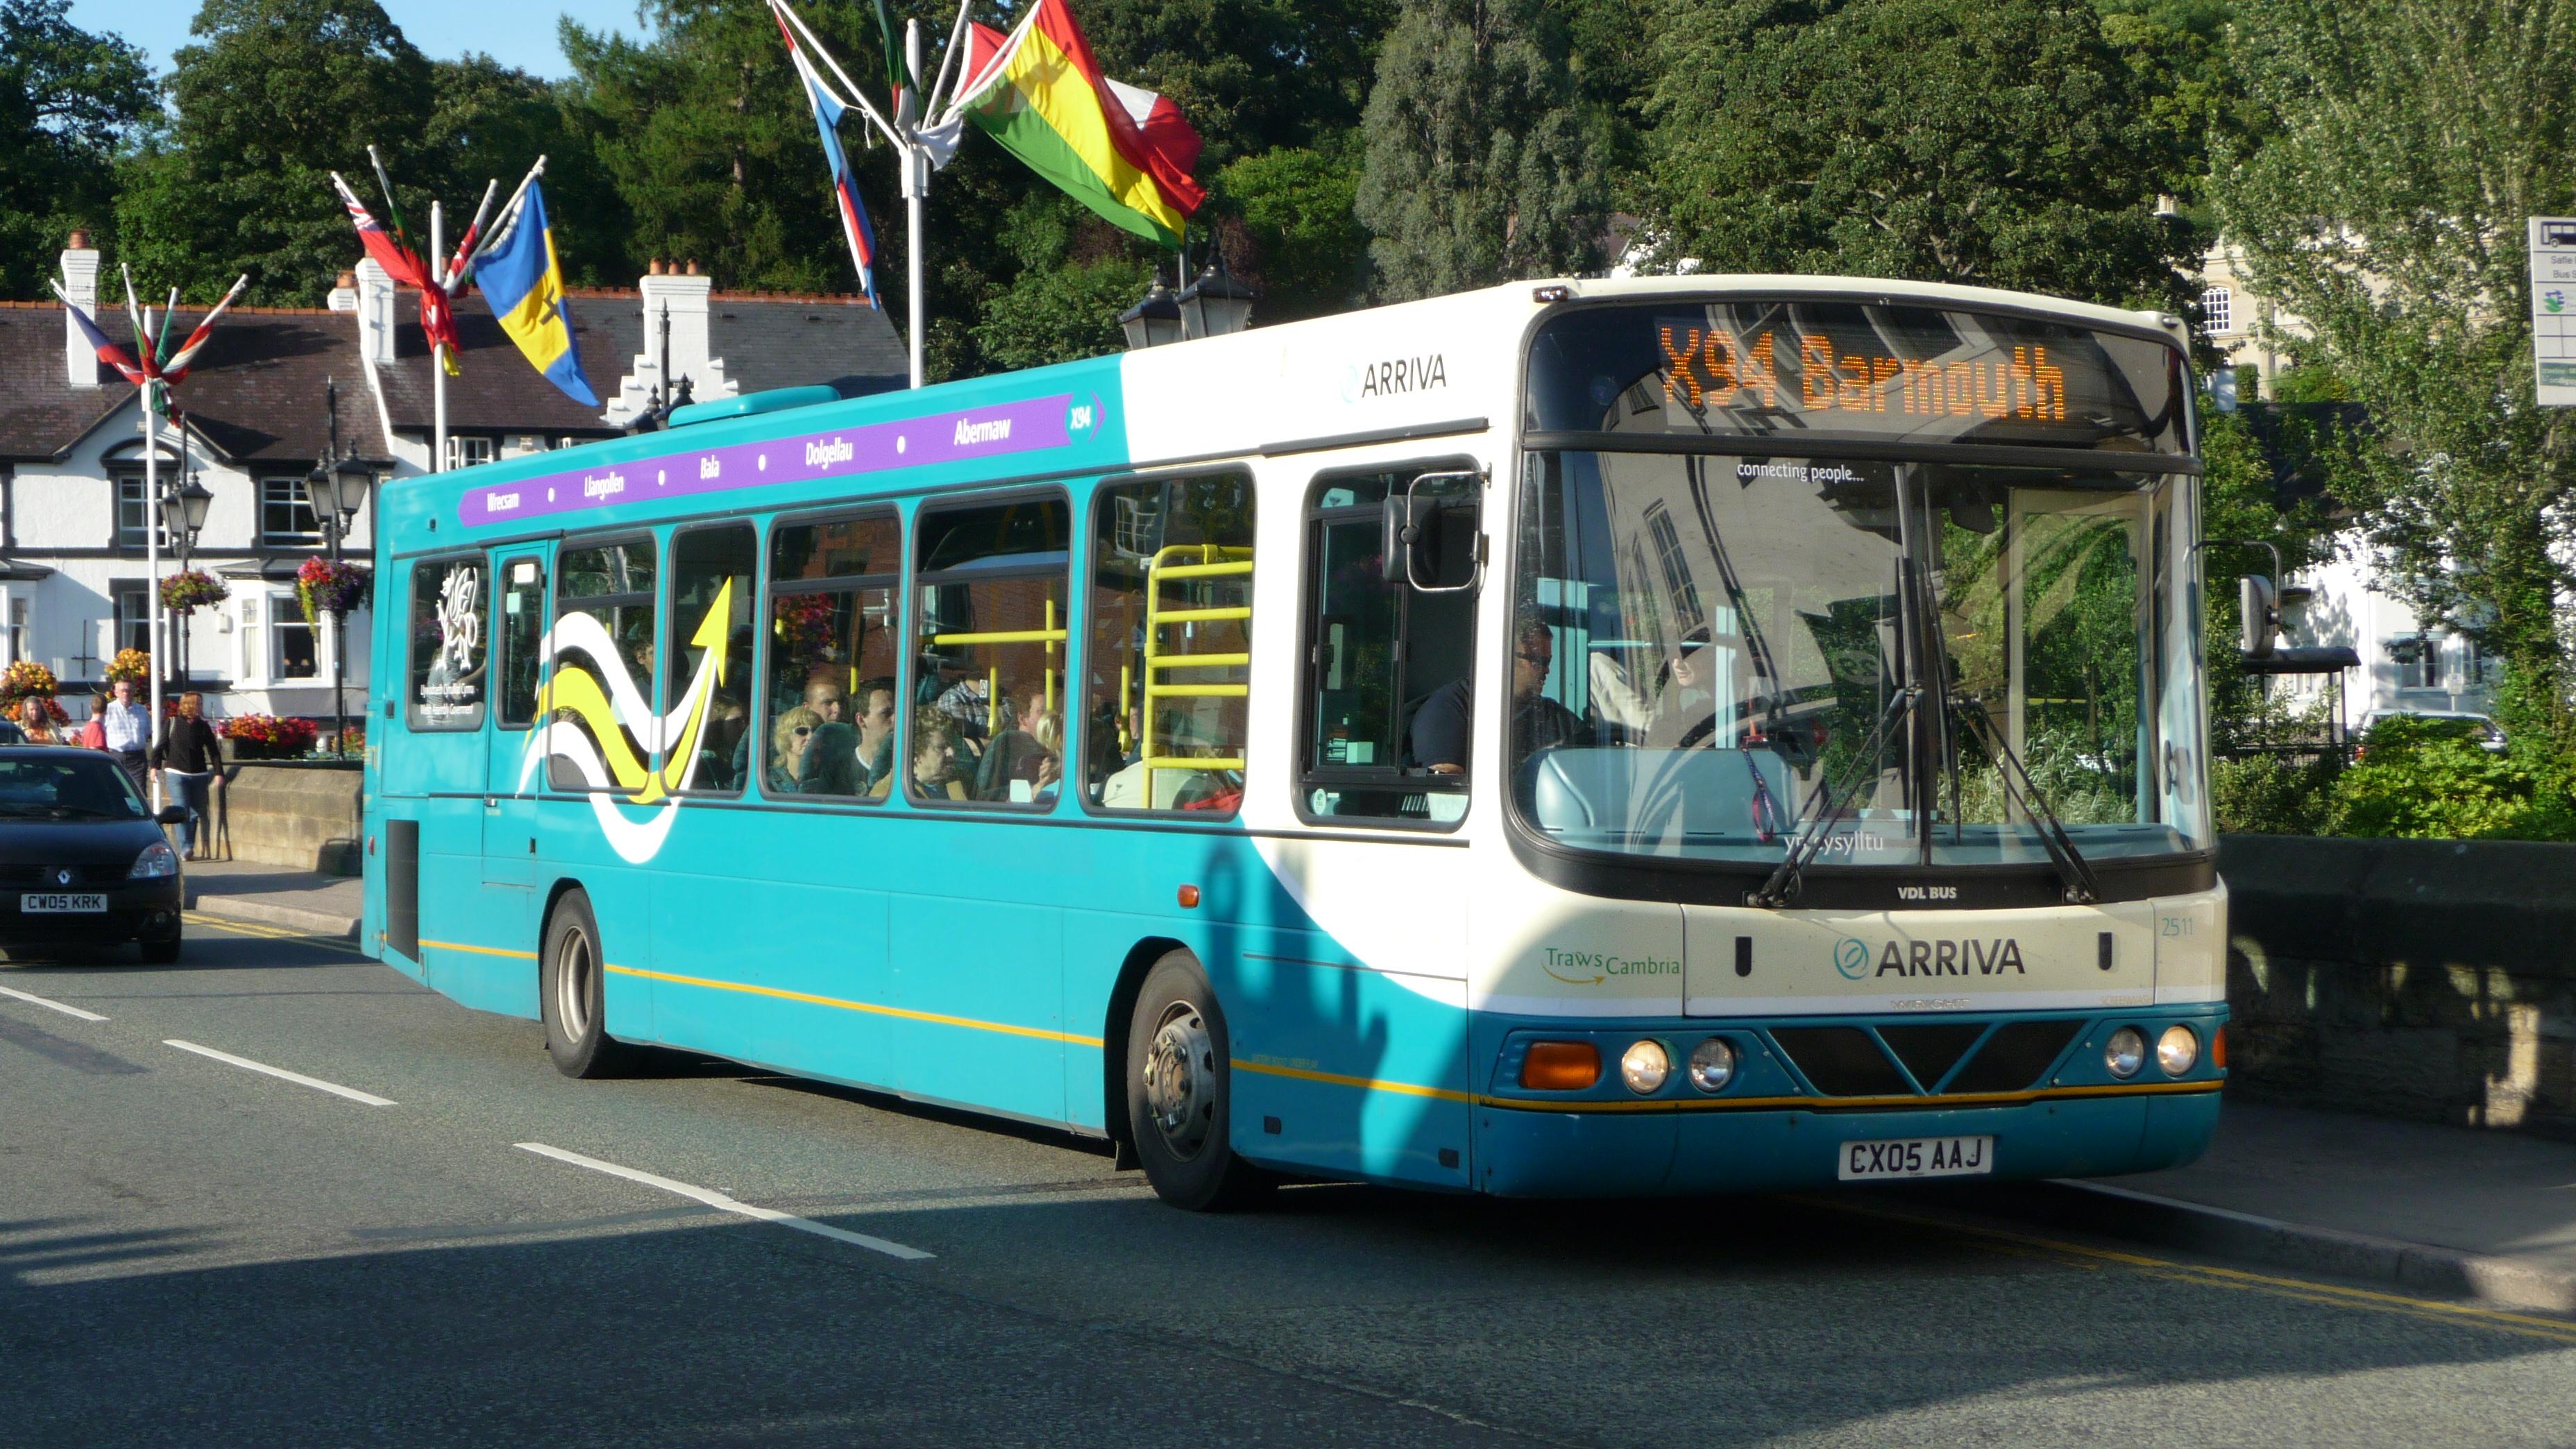 File:Arriva Buses Wales 2511 CX05 AAJ 3.JPG